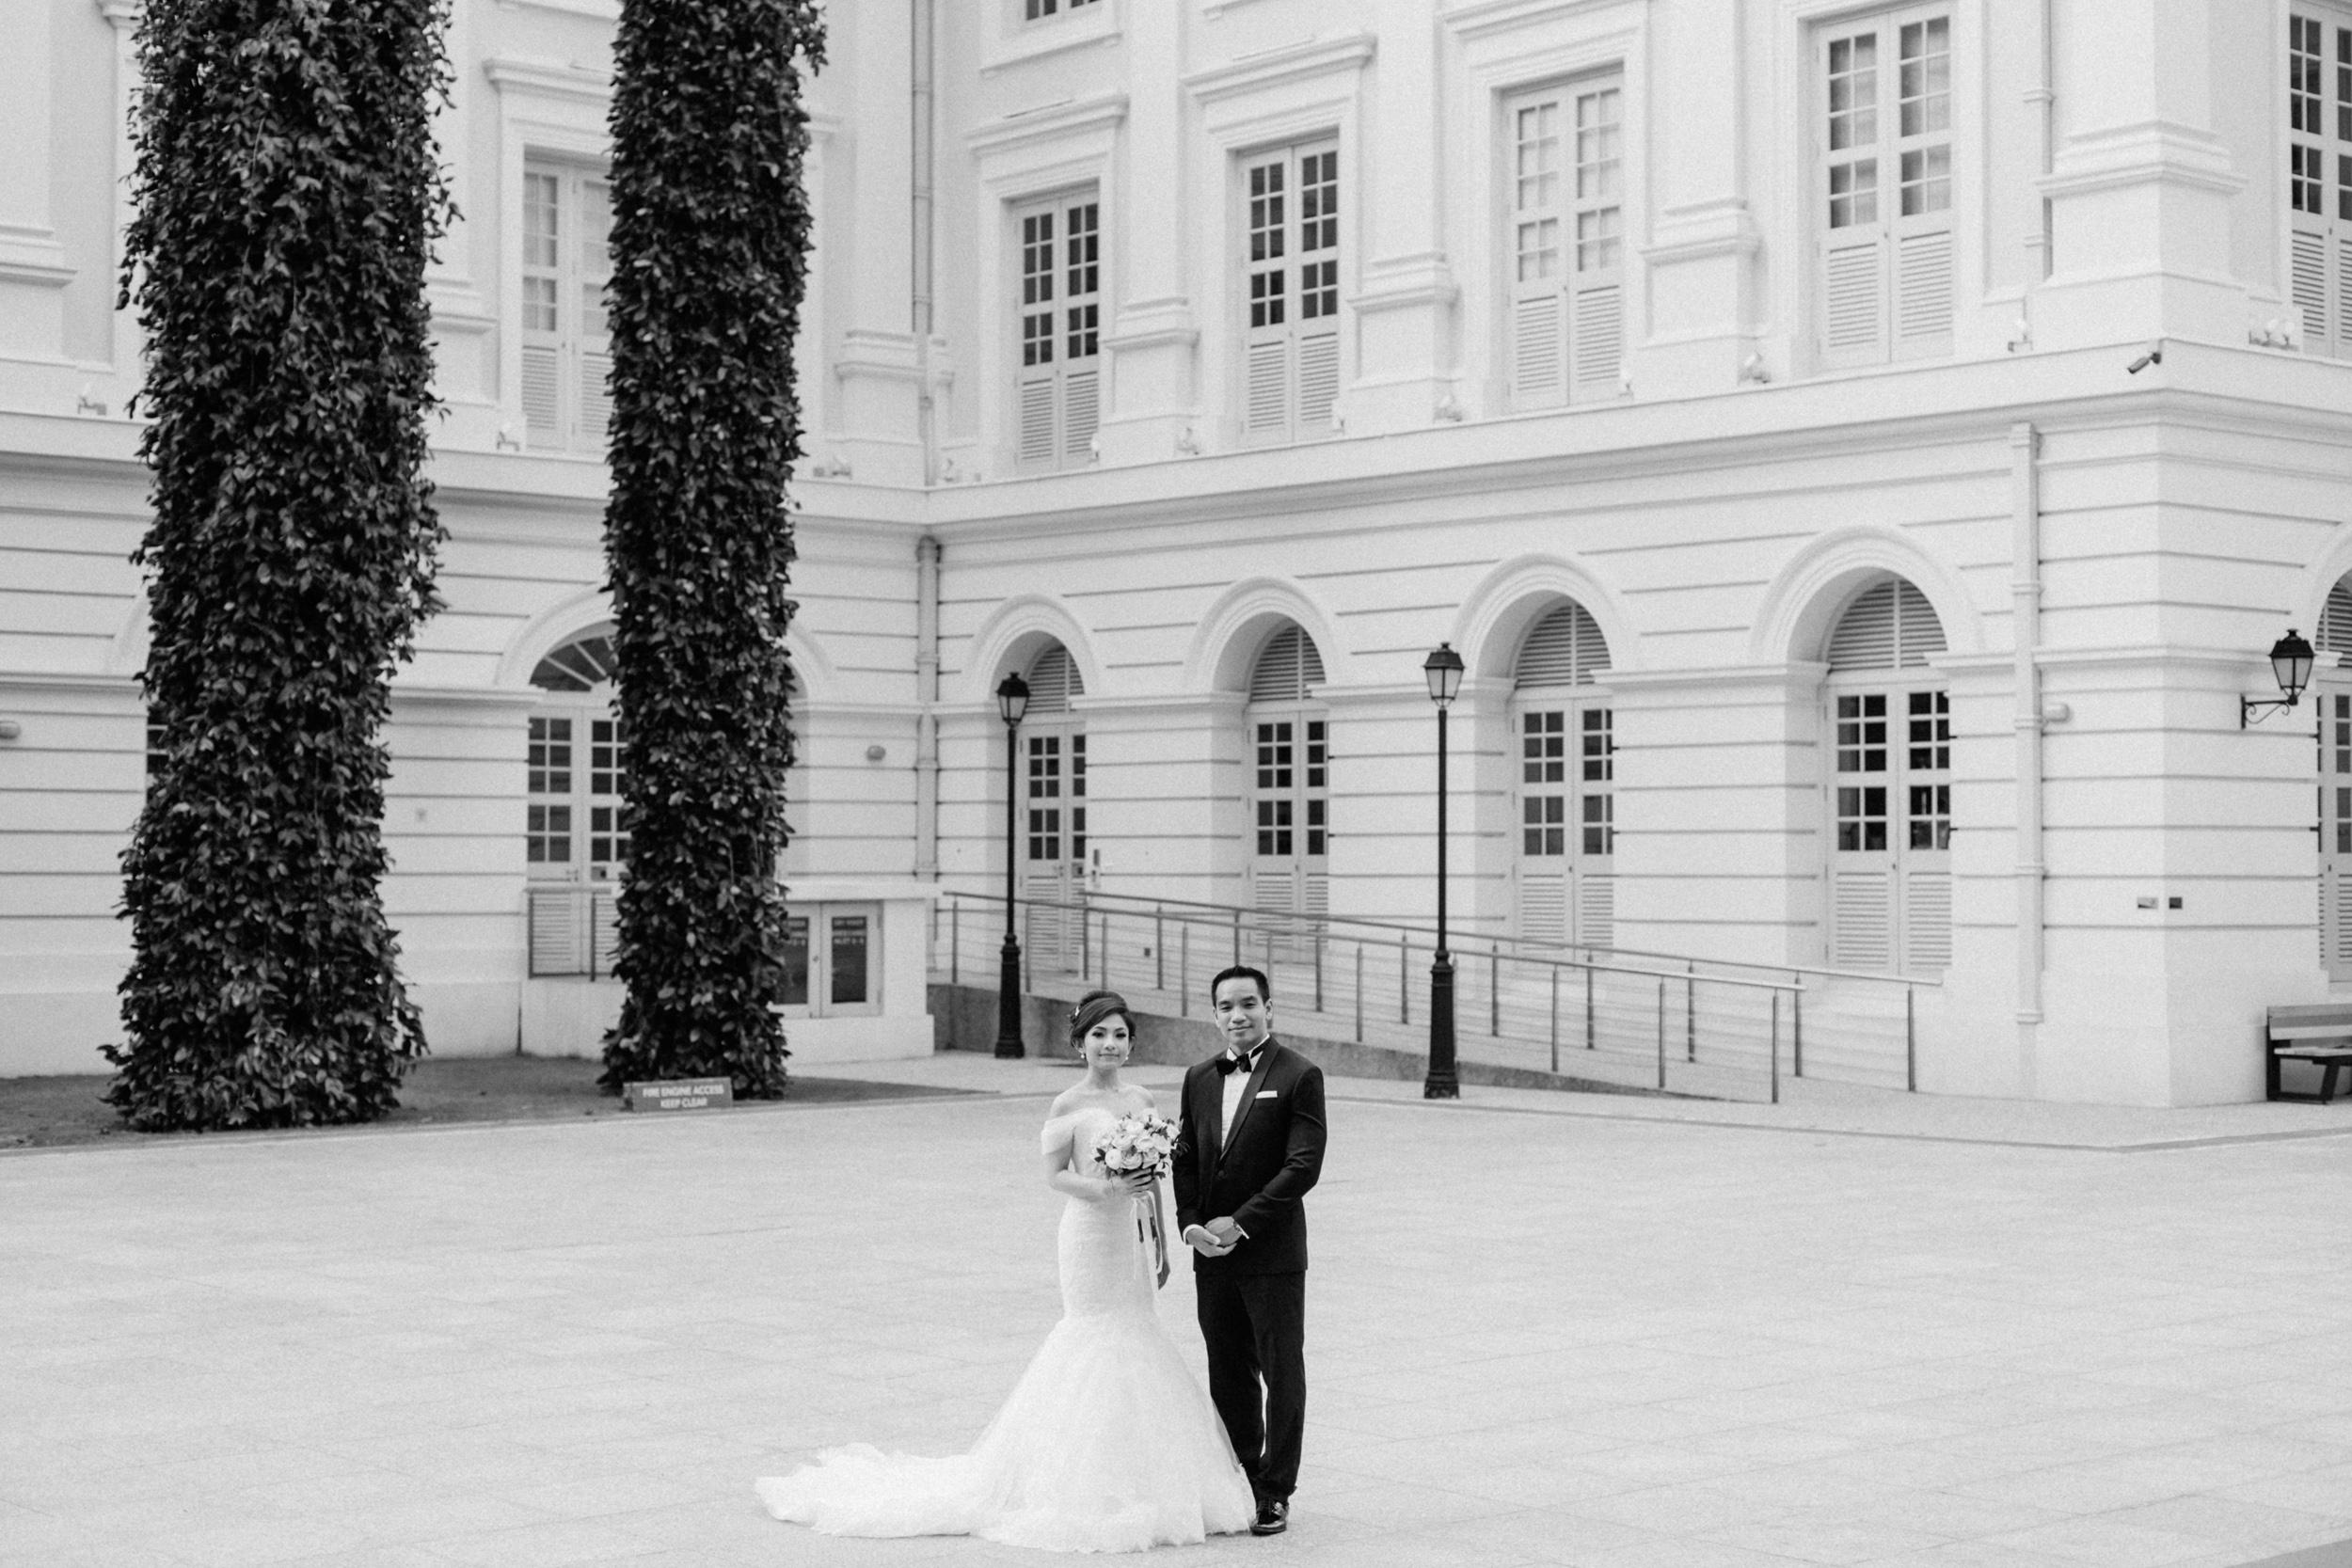 singapore-wedding-photographer-cheryl-matthew-fullerton-hotel-wedding-48.jpg